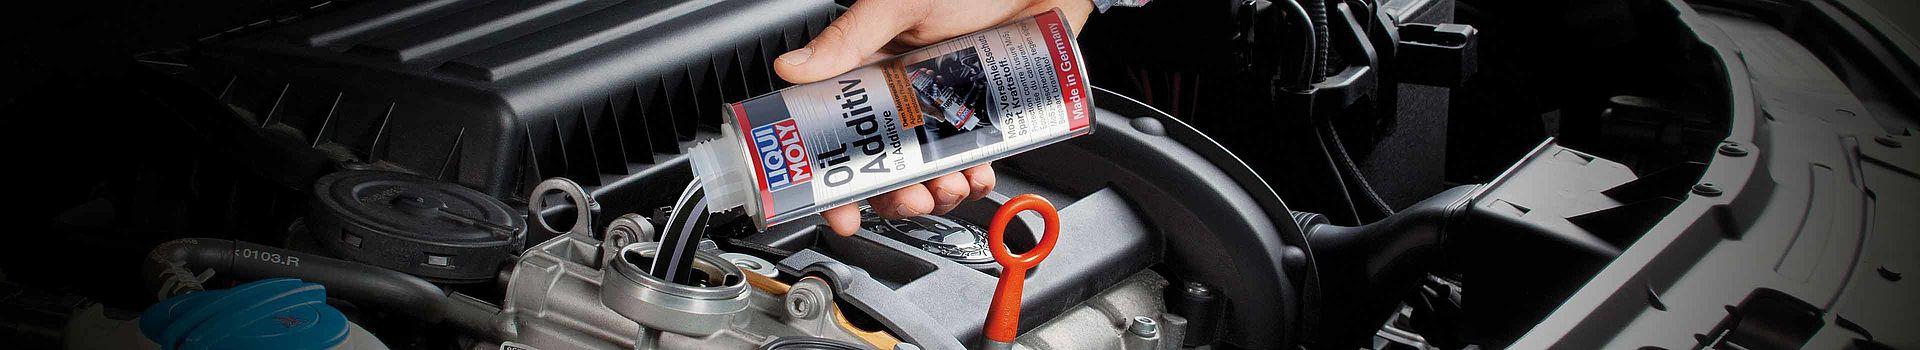 LIQUI MOLYの添加剤を車両のエンジンオイルのタンクに注入。